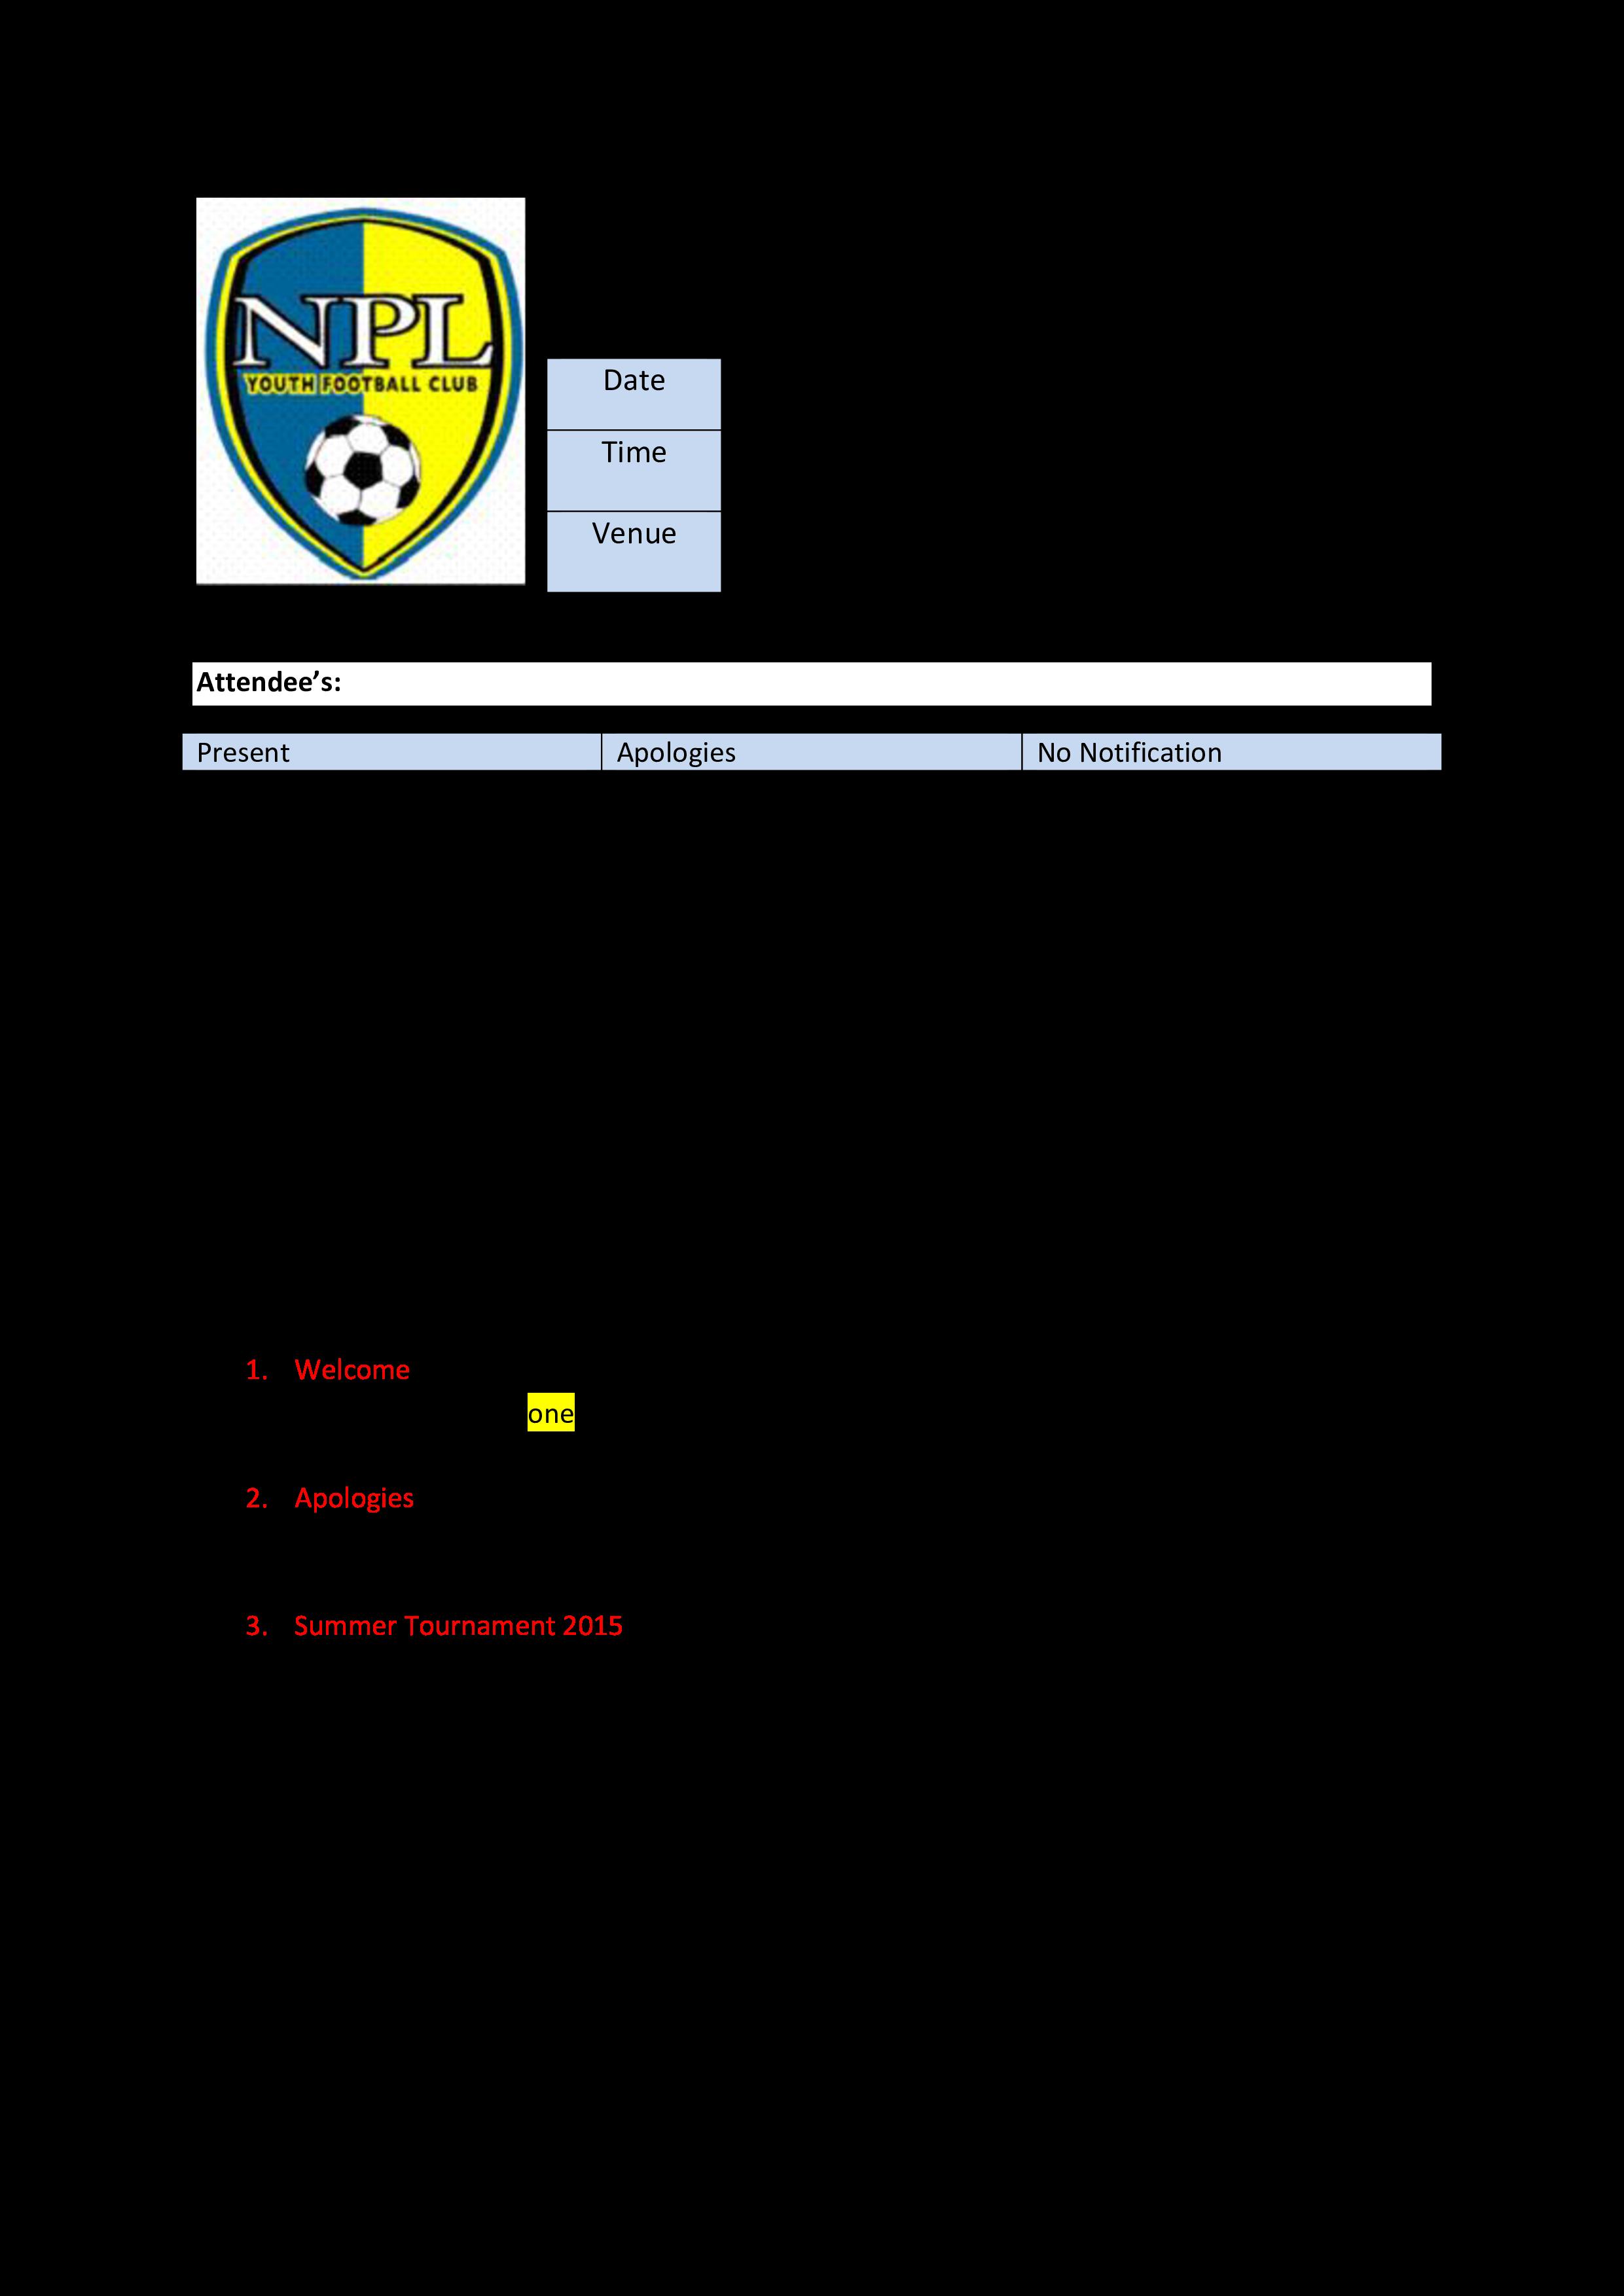 football club meeting agenda main image download template